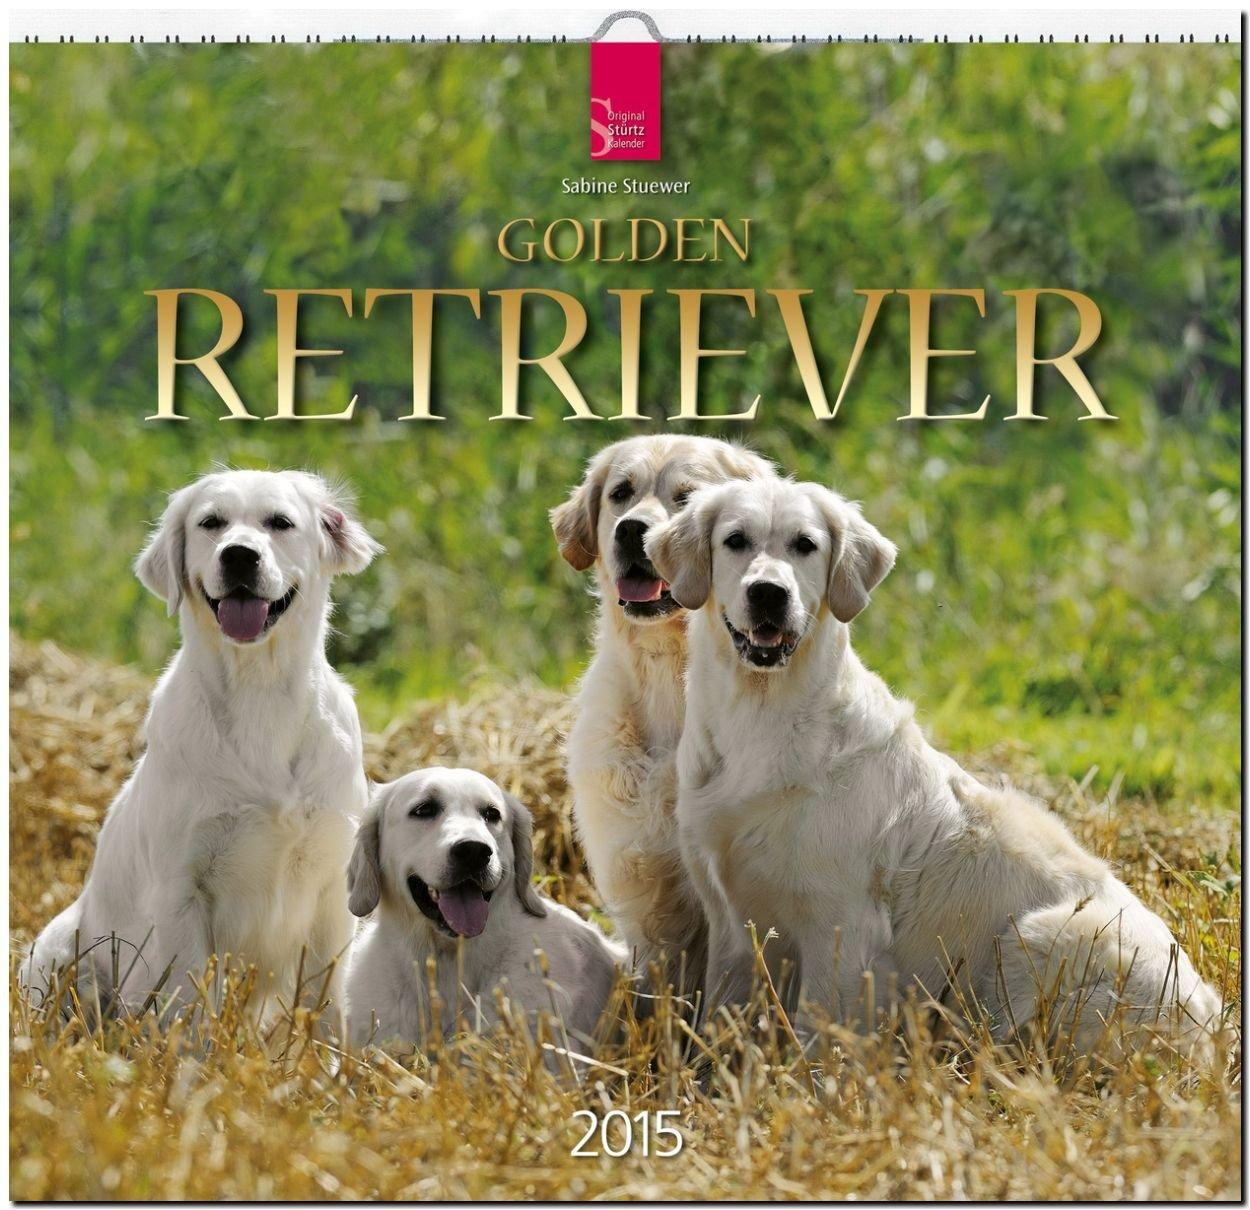 Golden Retriever 2015 - Original Stürtz-Kalender - Mittelformat-Kalender 33 x 31 cm